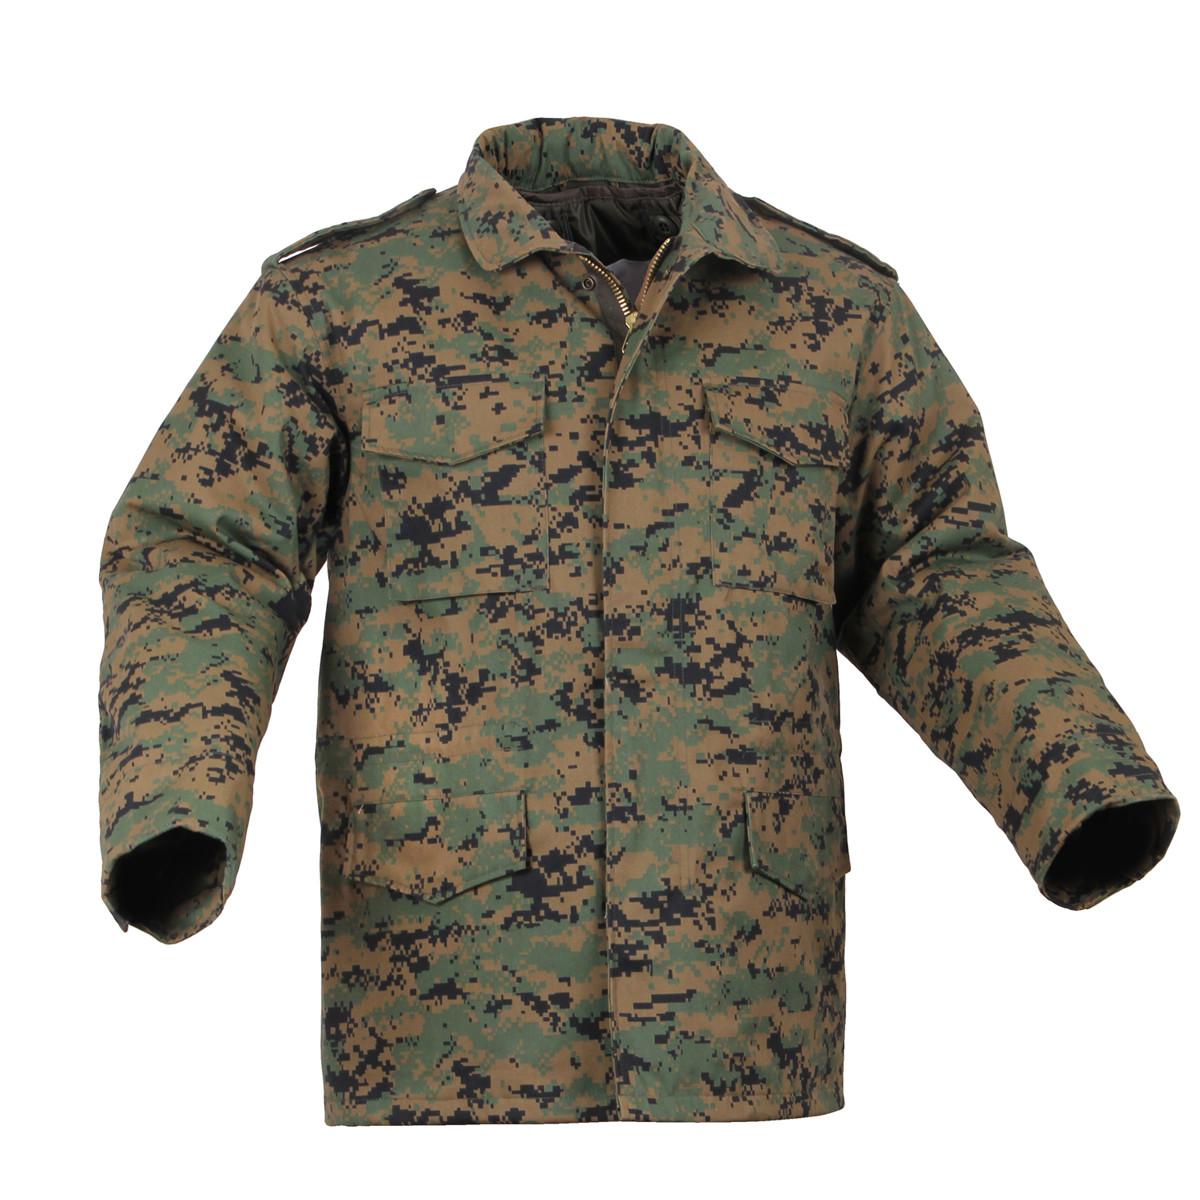 9706013031eaa Shop Military Woodland Digital Camo M-65 Field Jackets - Fatigues Army Navy